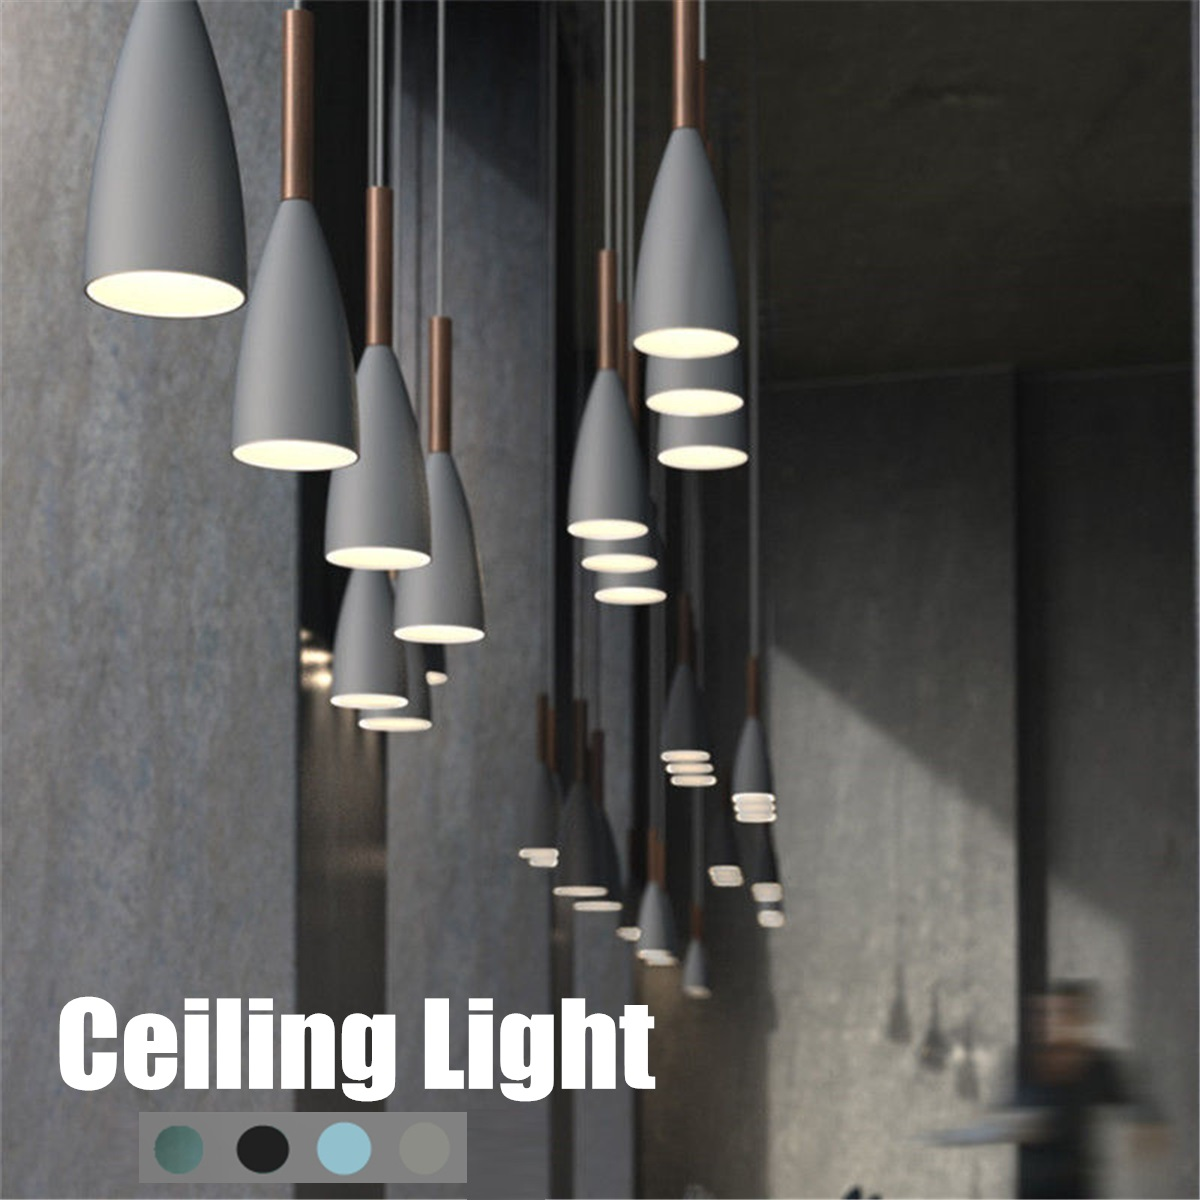 LED Hanging lamp Modern Vintage Loft Pendant Lights/Pendant Lamps Aluminum Suspension luminaire Wood Hanging Lightings KitchenLED Hanging lamp Modern Vintage Loft Pendant Lights/Pendant Lamps Aluminum Suspension luminaire Wood Hanging Lightings Kitchen